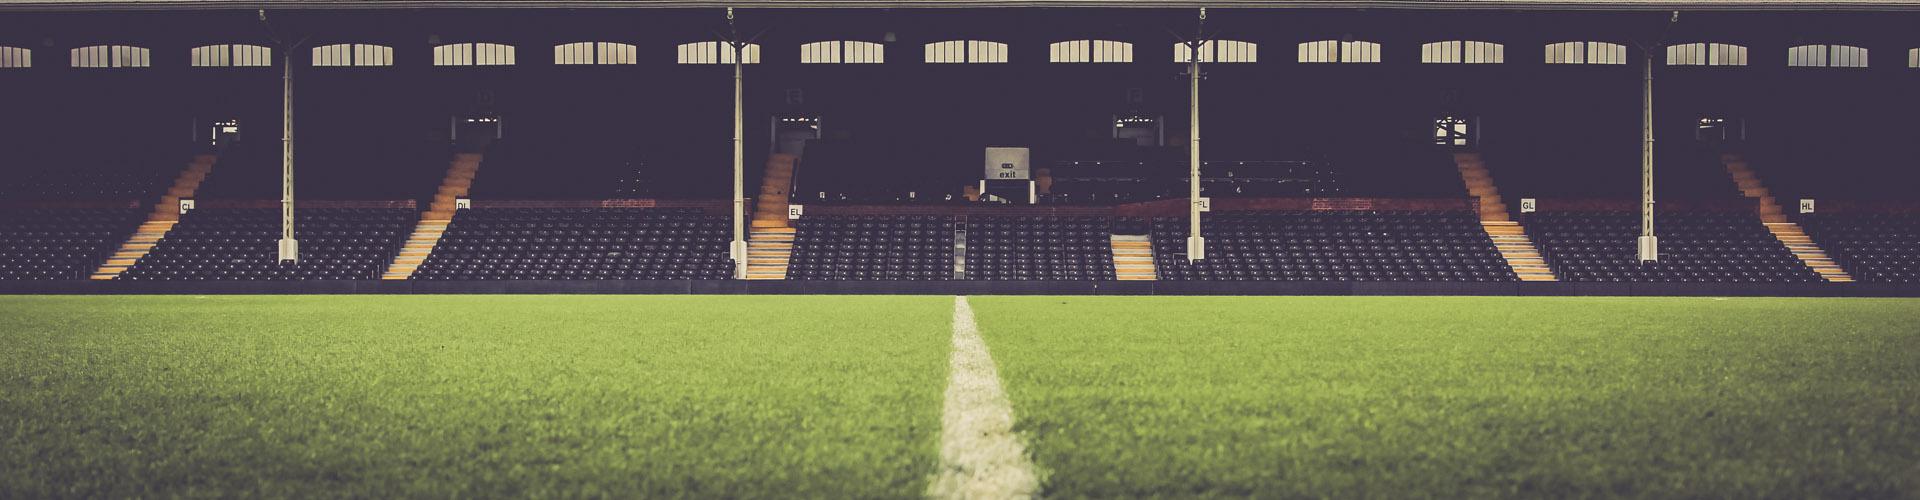 Stadion Rasen